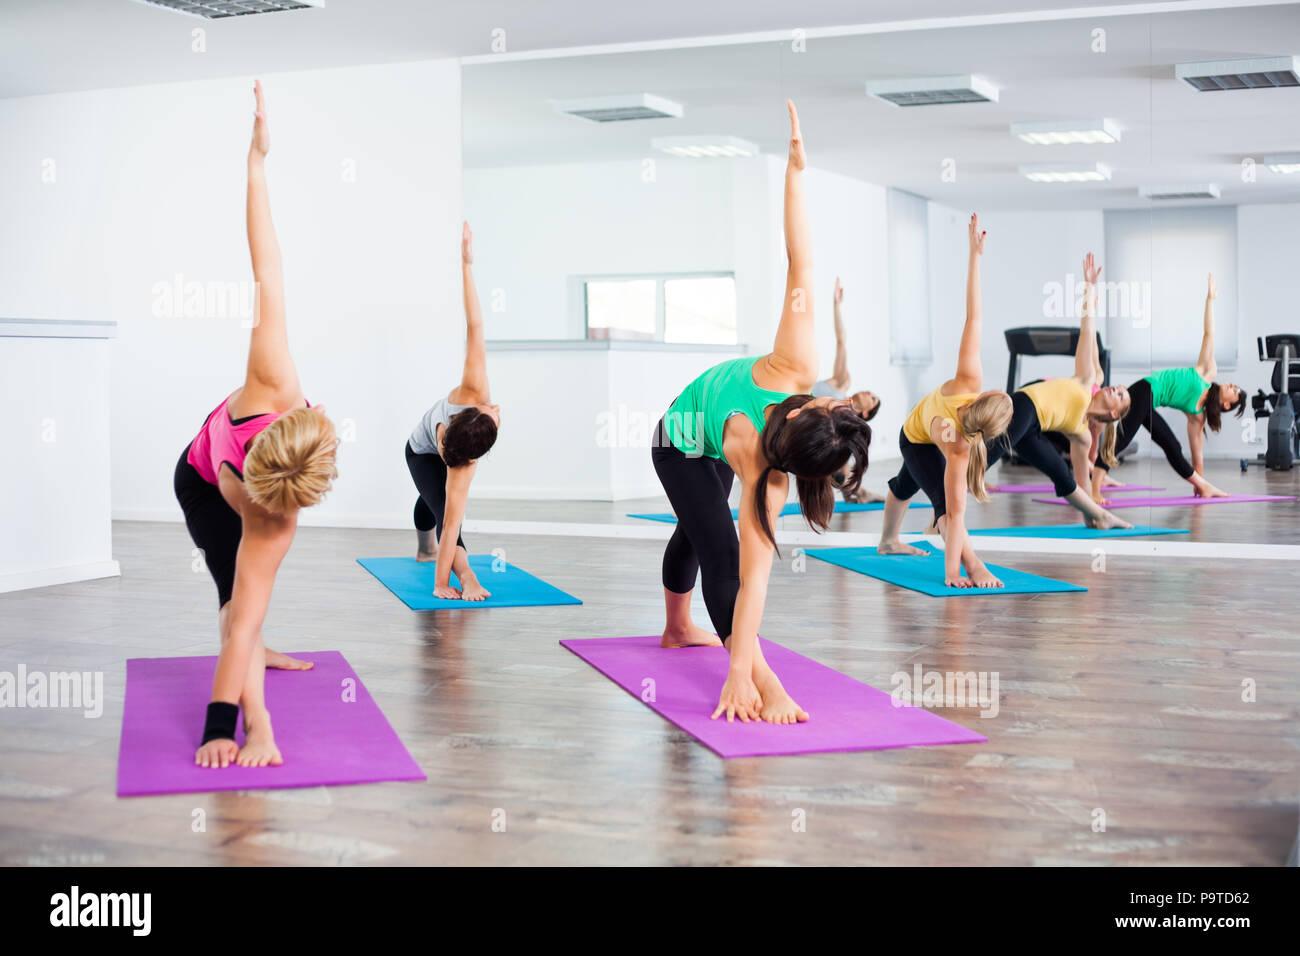 Four girls practicing yoga, Trikonasana / Bikram triangle right pose - Stock Image